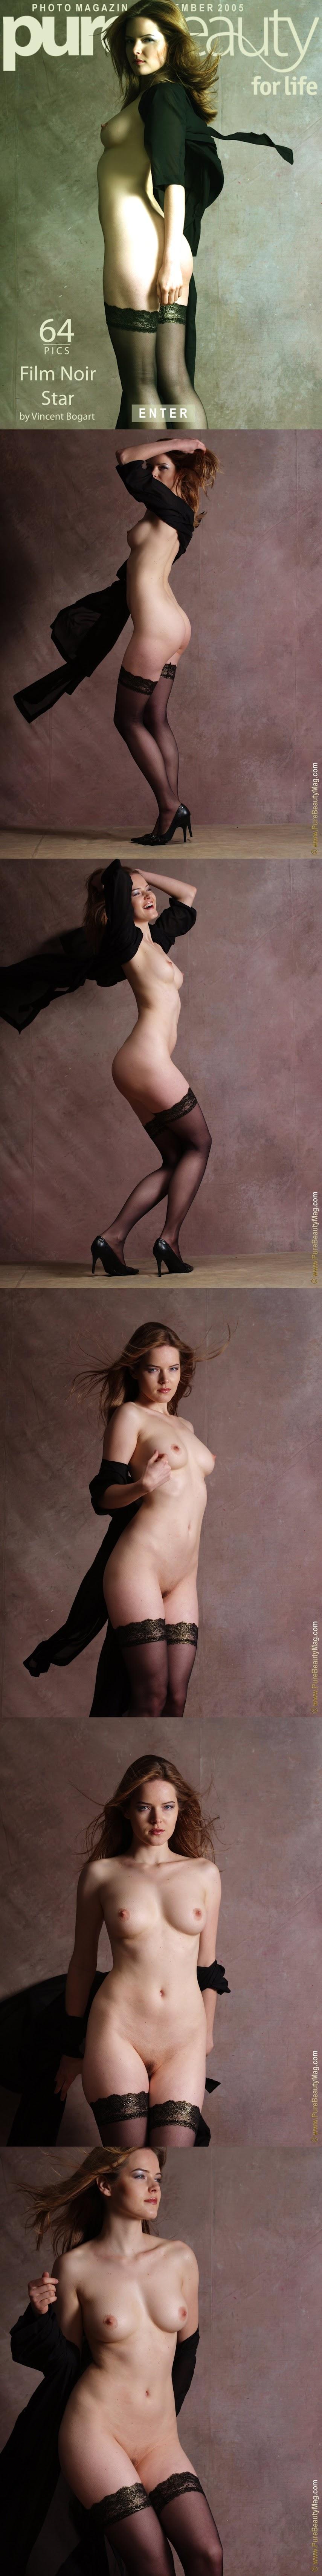 PureBeautyMag PBM  - 2005-12-23 - #s158181 - Andrea - Eros Chrono - 3008px - Girlsdelta